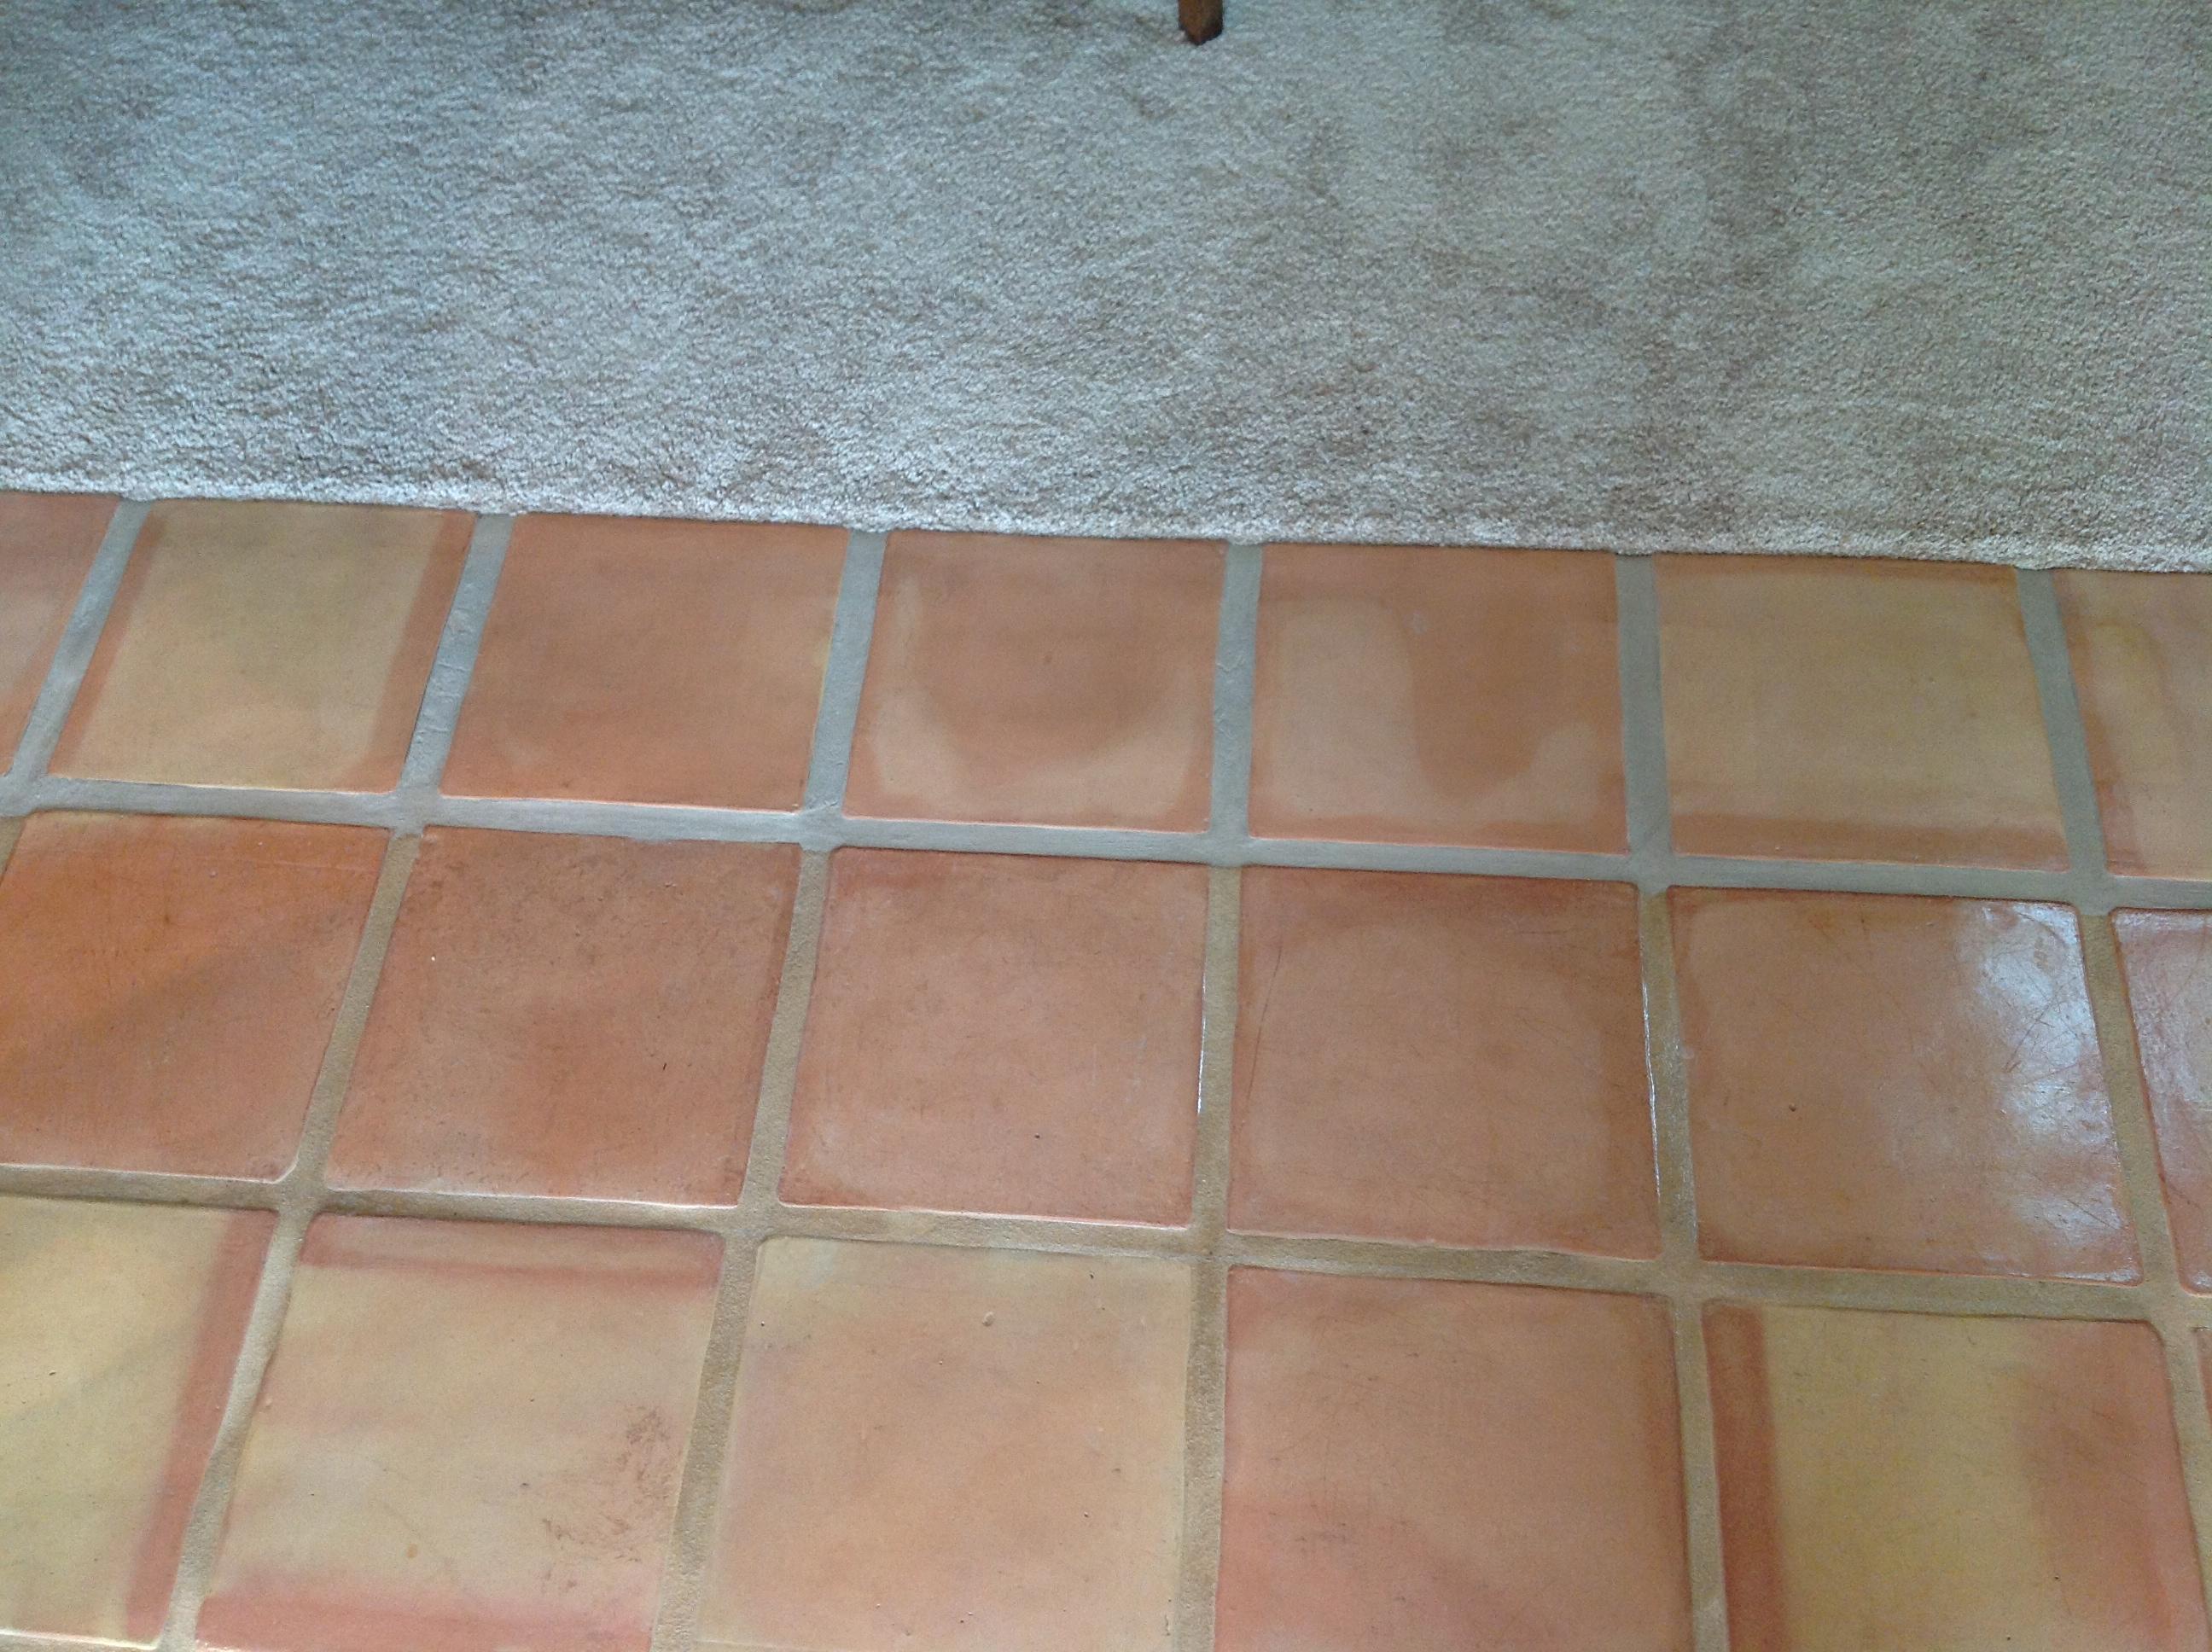 saltillo tile dirty peeling dull california tile refinishing img saltillo tile dirty peeling dull